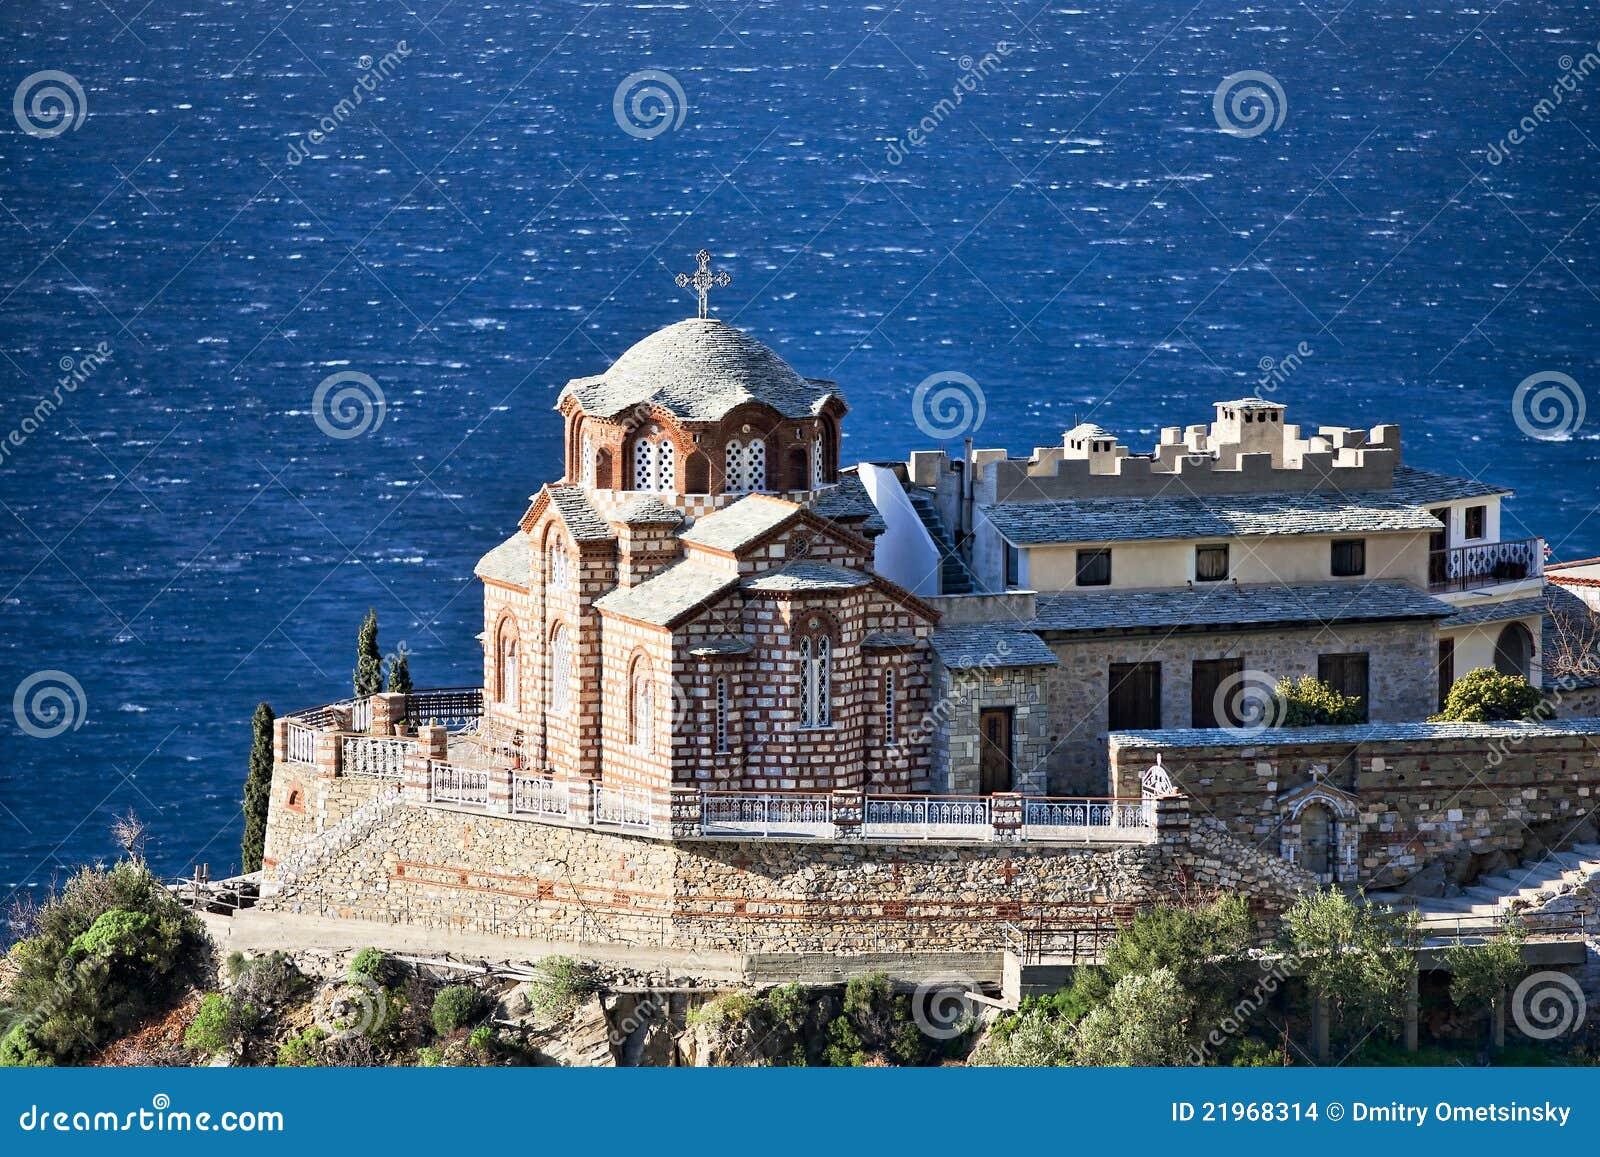 Igreja ortodoxa bizantina em uma rocha acima do mar